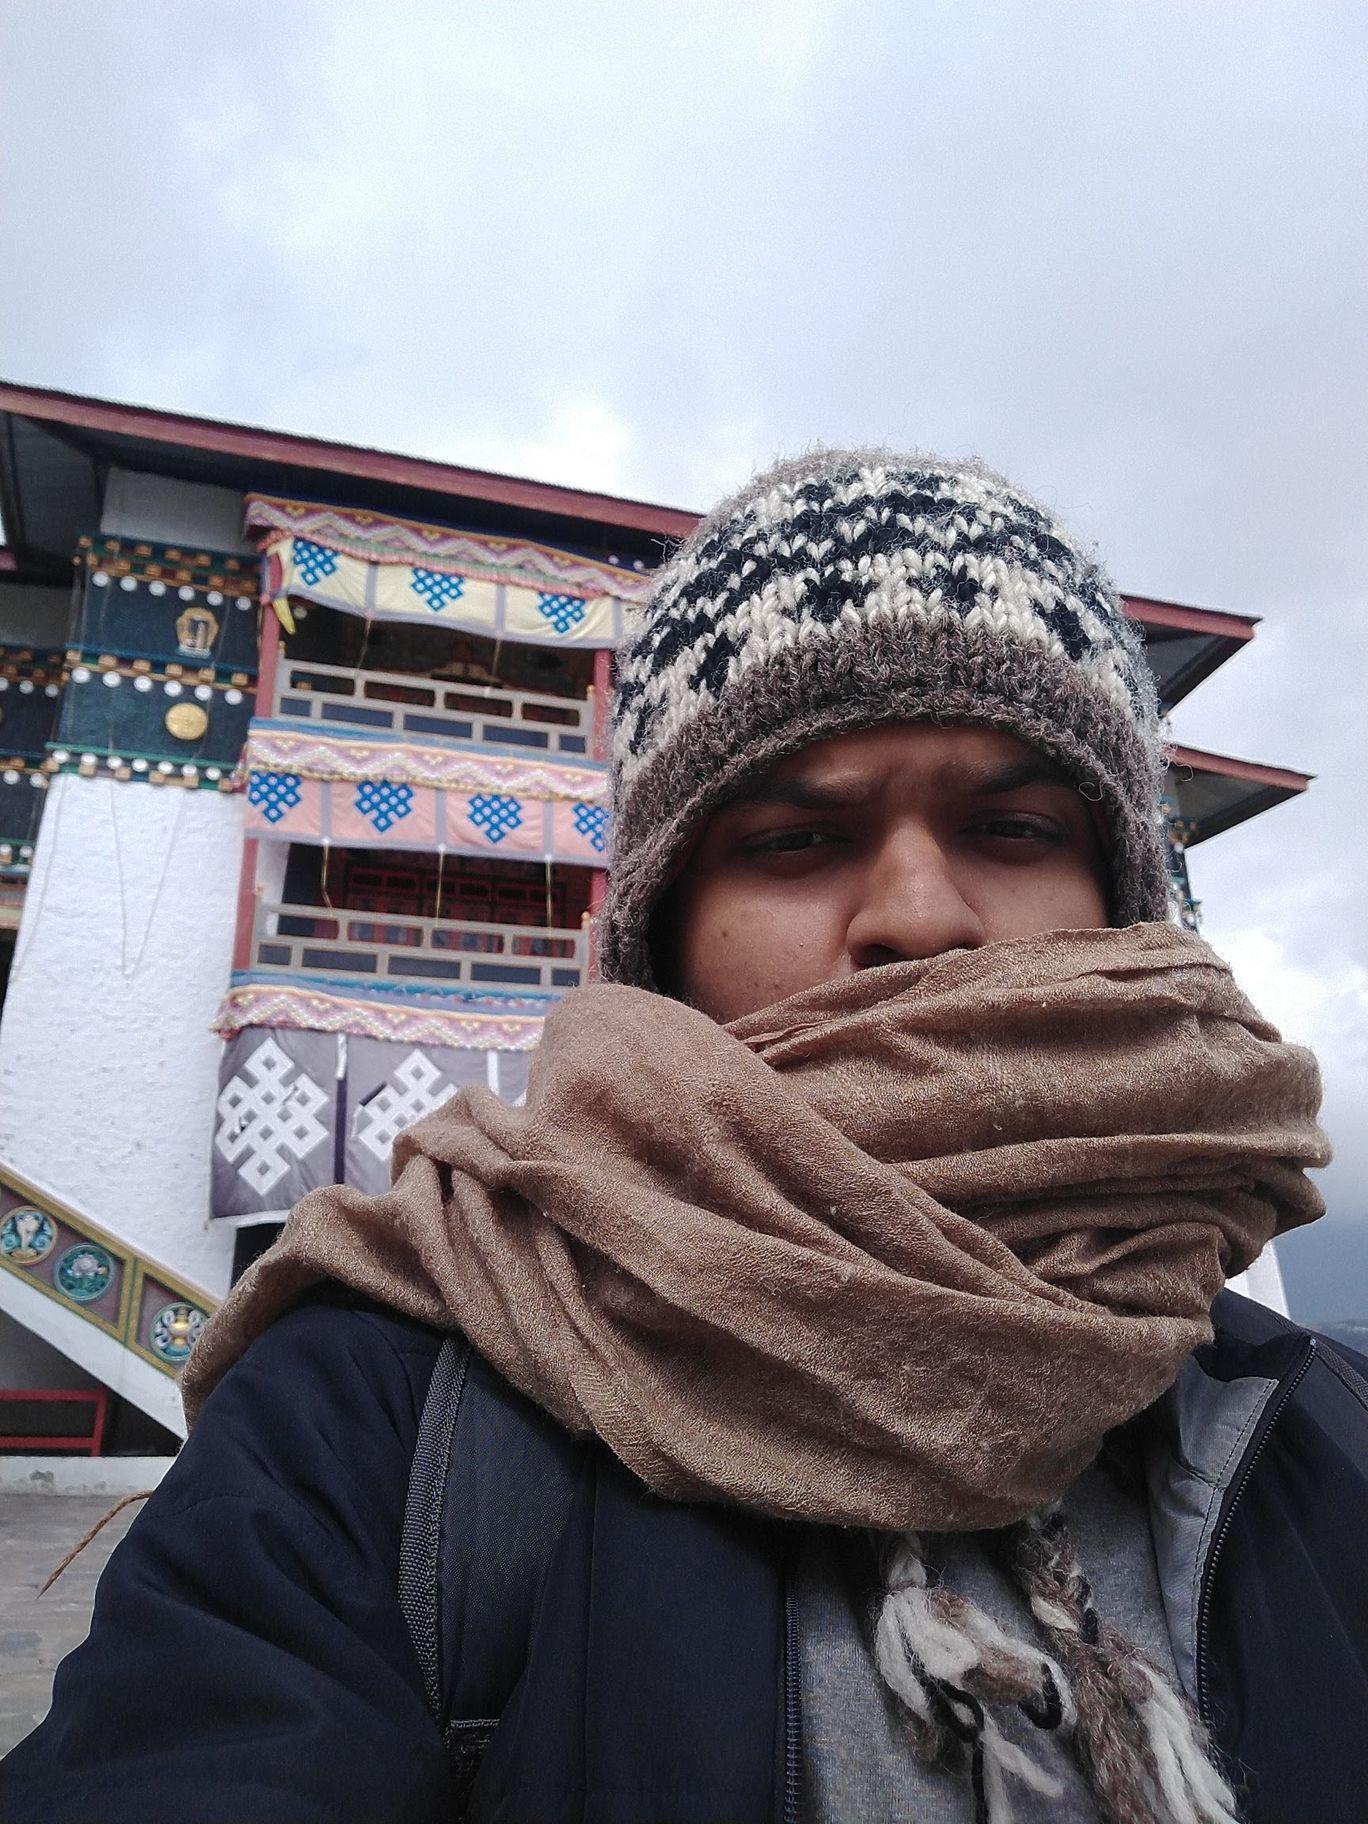 Photo of Arunachal Pradesh By anurag sharma